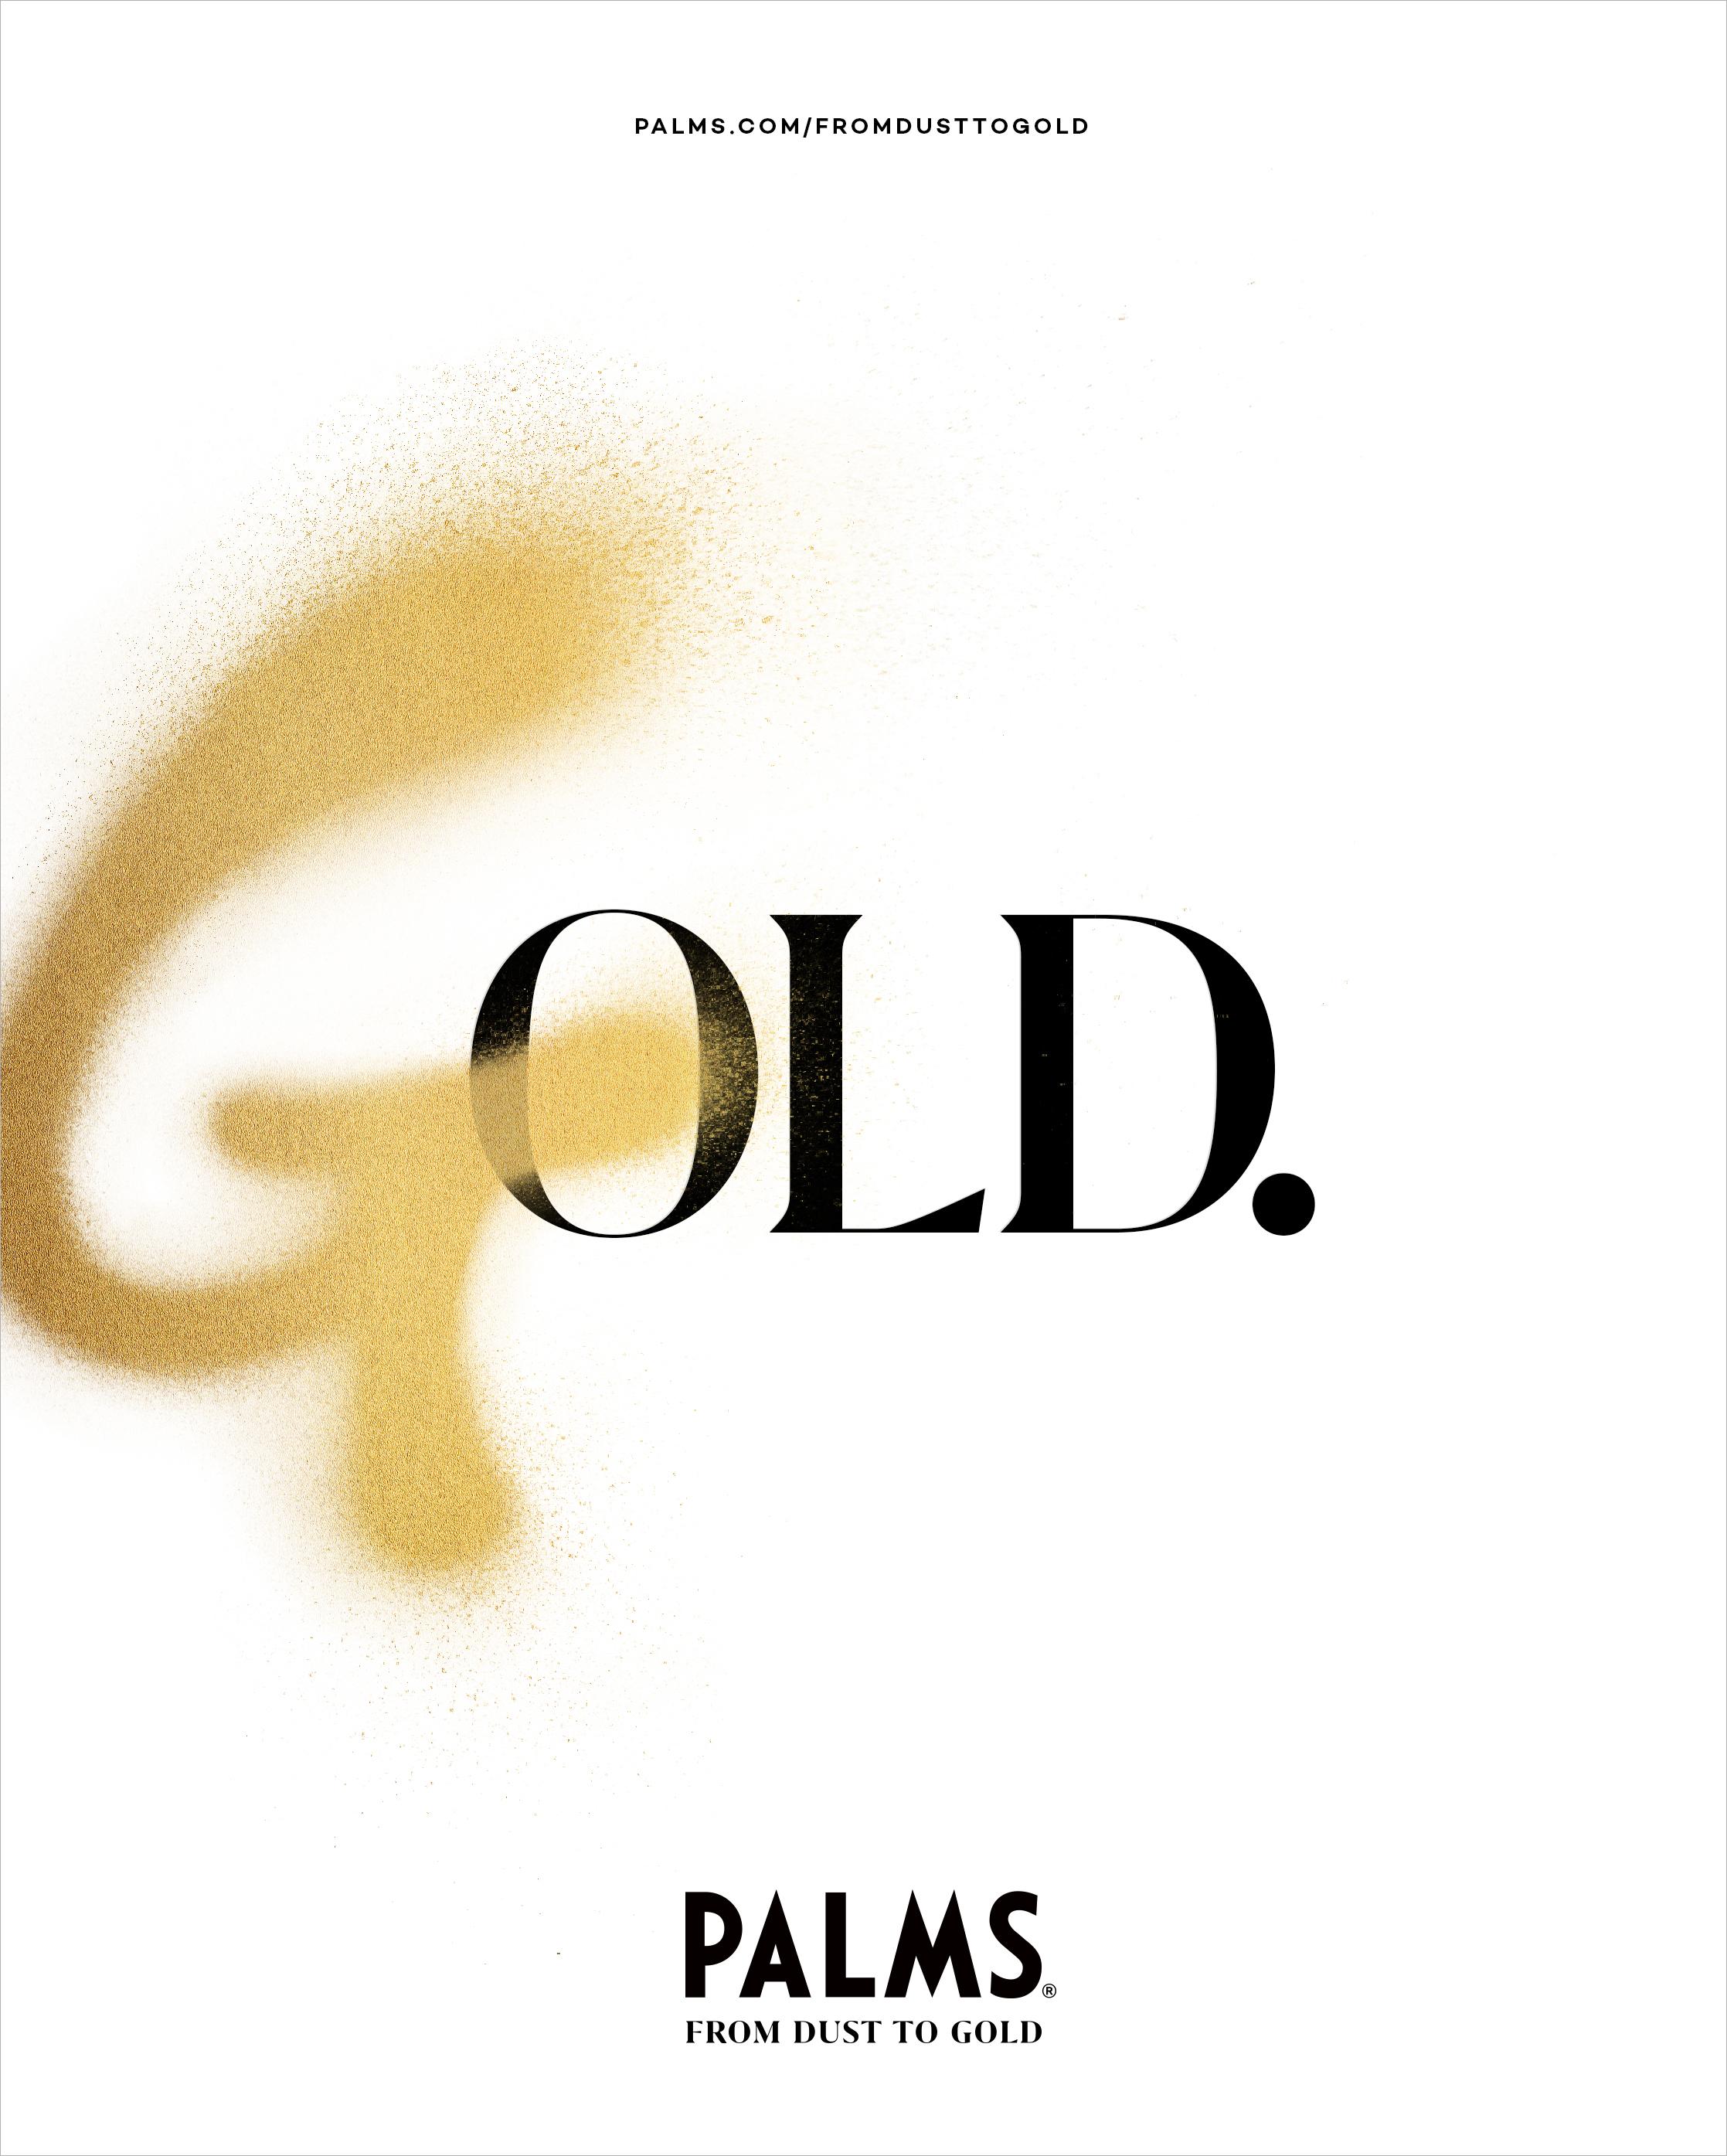 Palms-Print-Gold copy.jpg